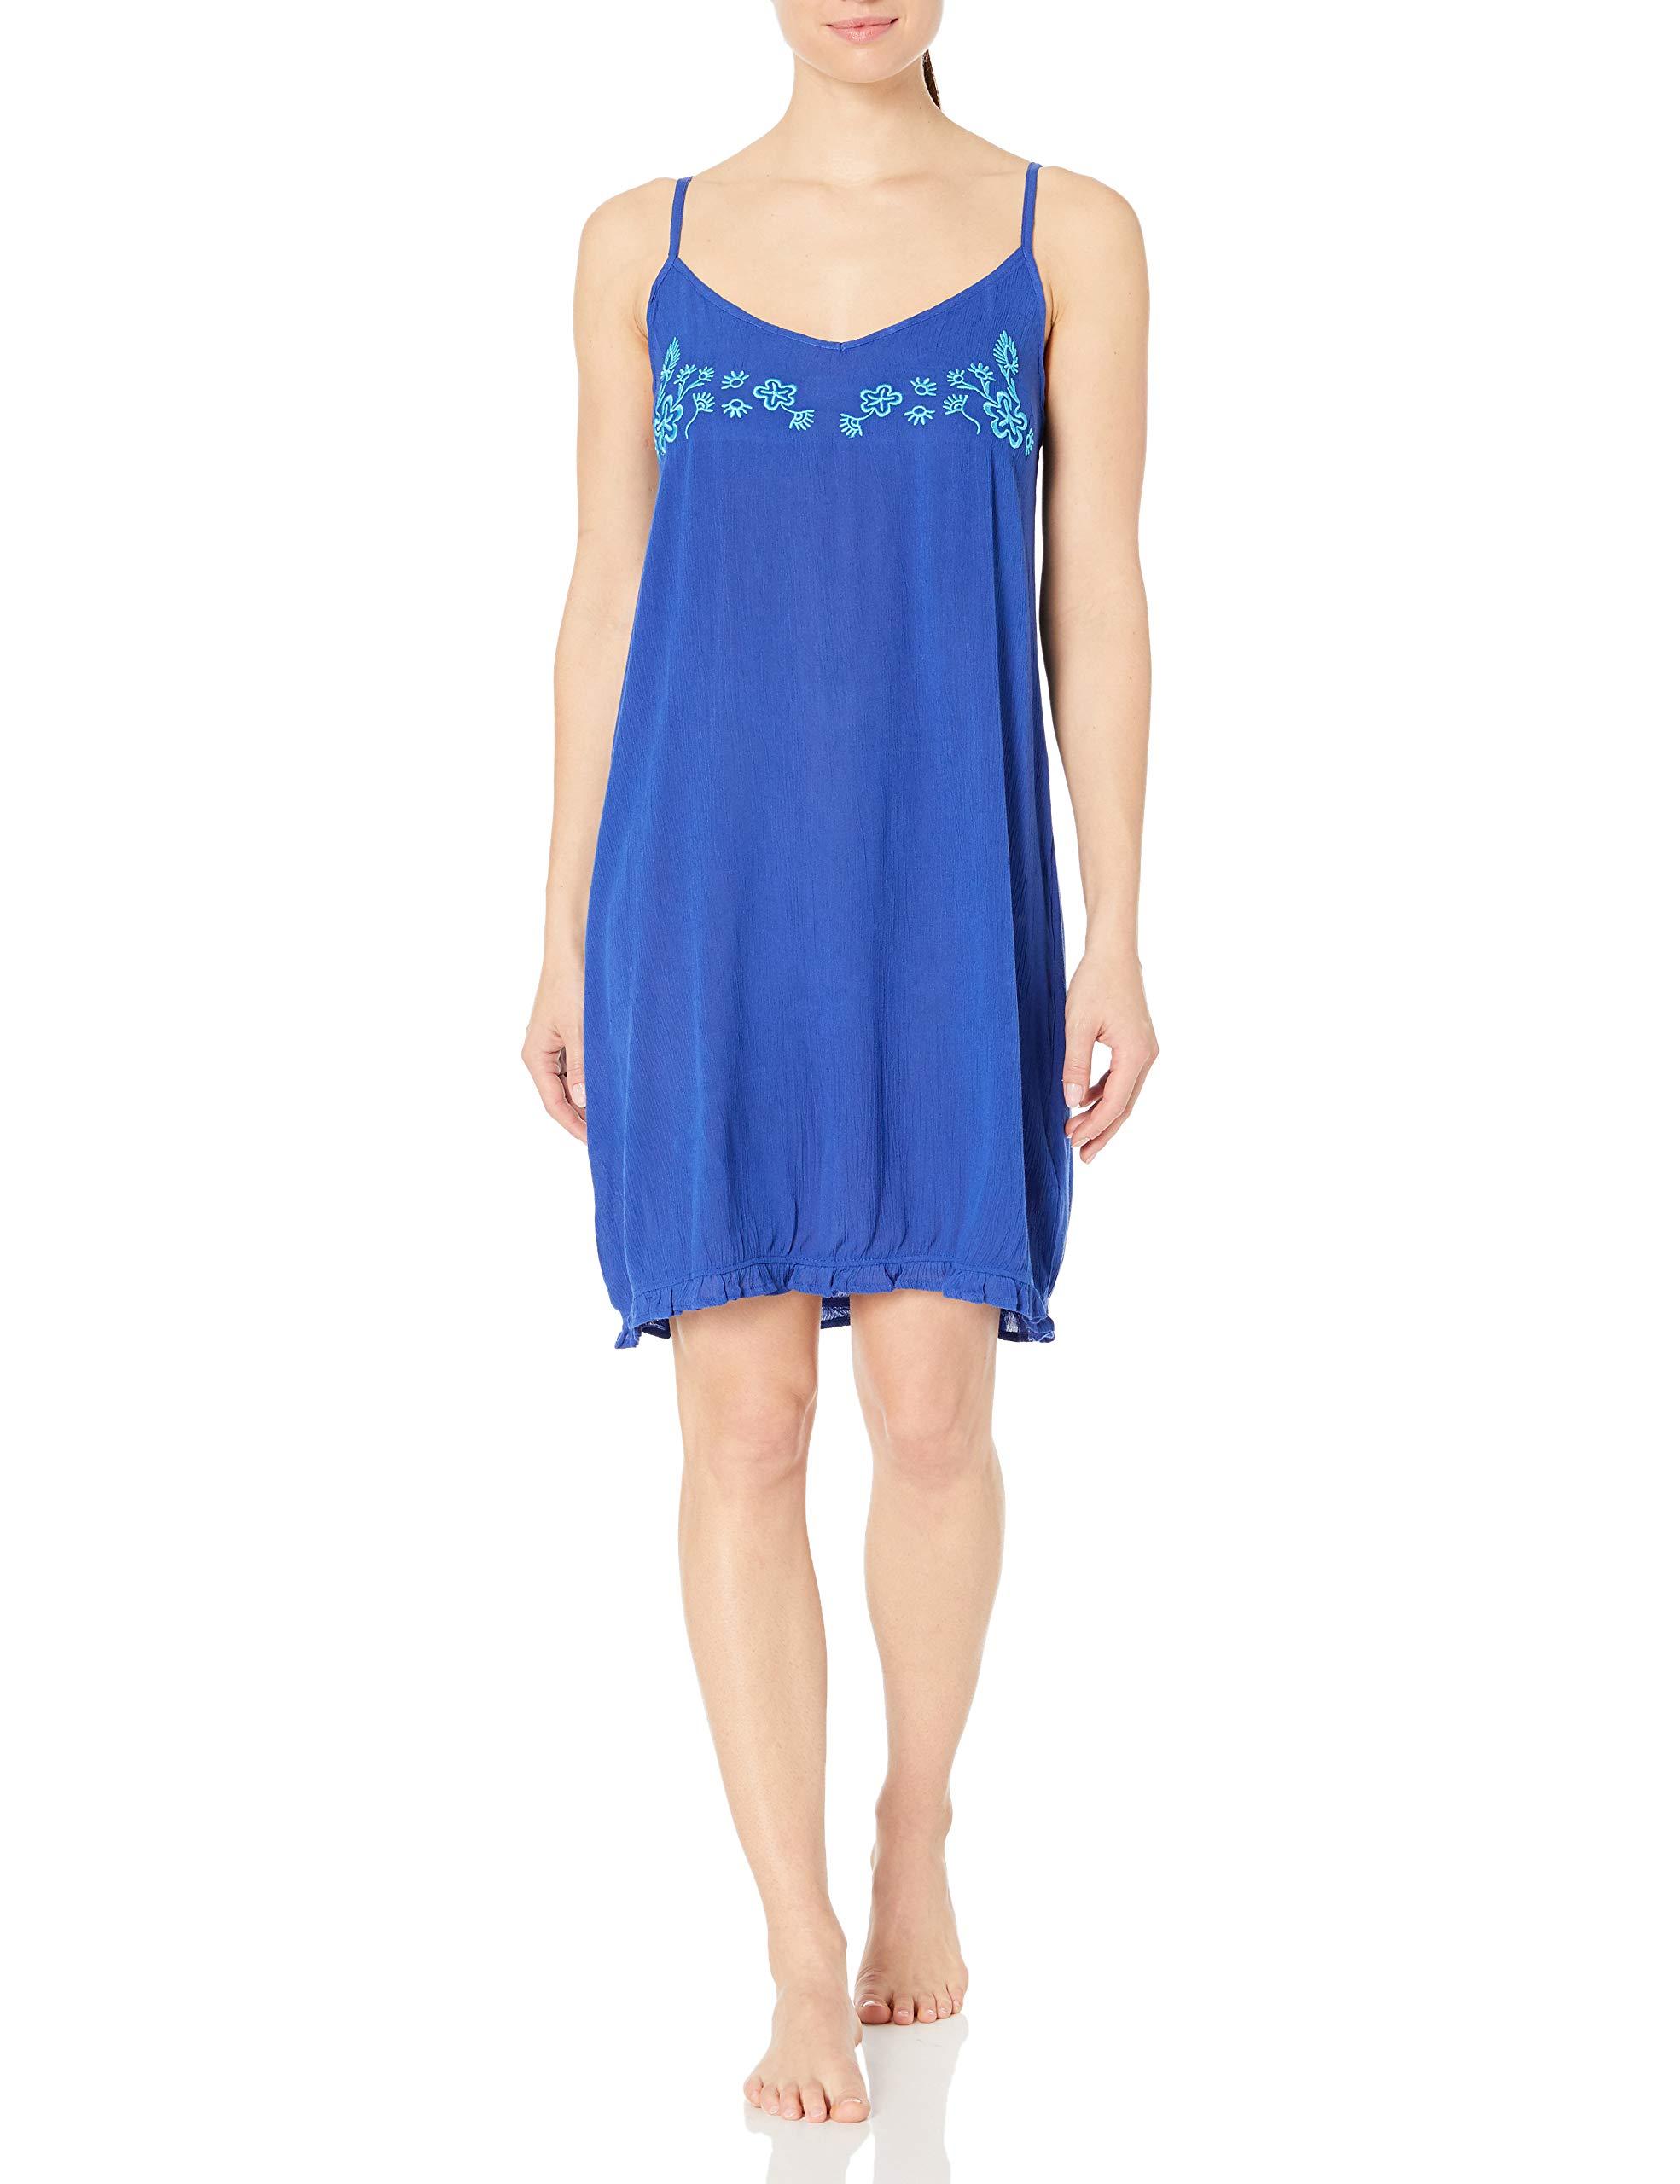 Amazon Brand - Mae Women's Sleepwear Crinkle Crepe Chemise Nightgown